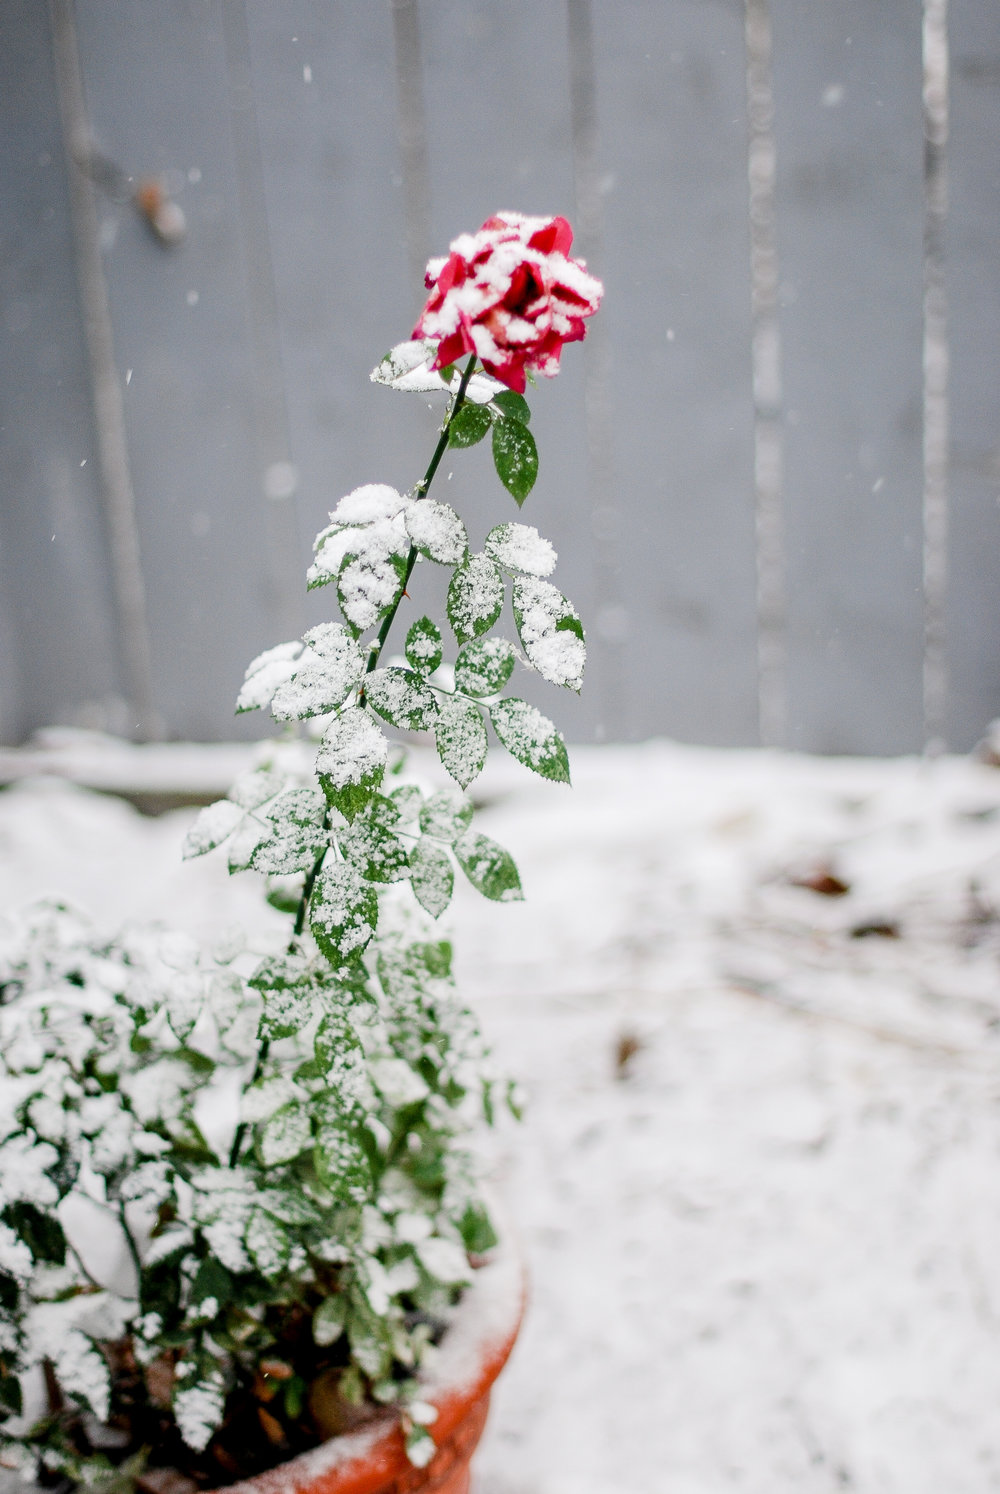 snow in october-9.jpg